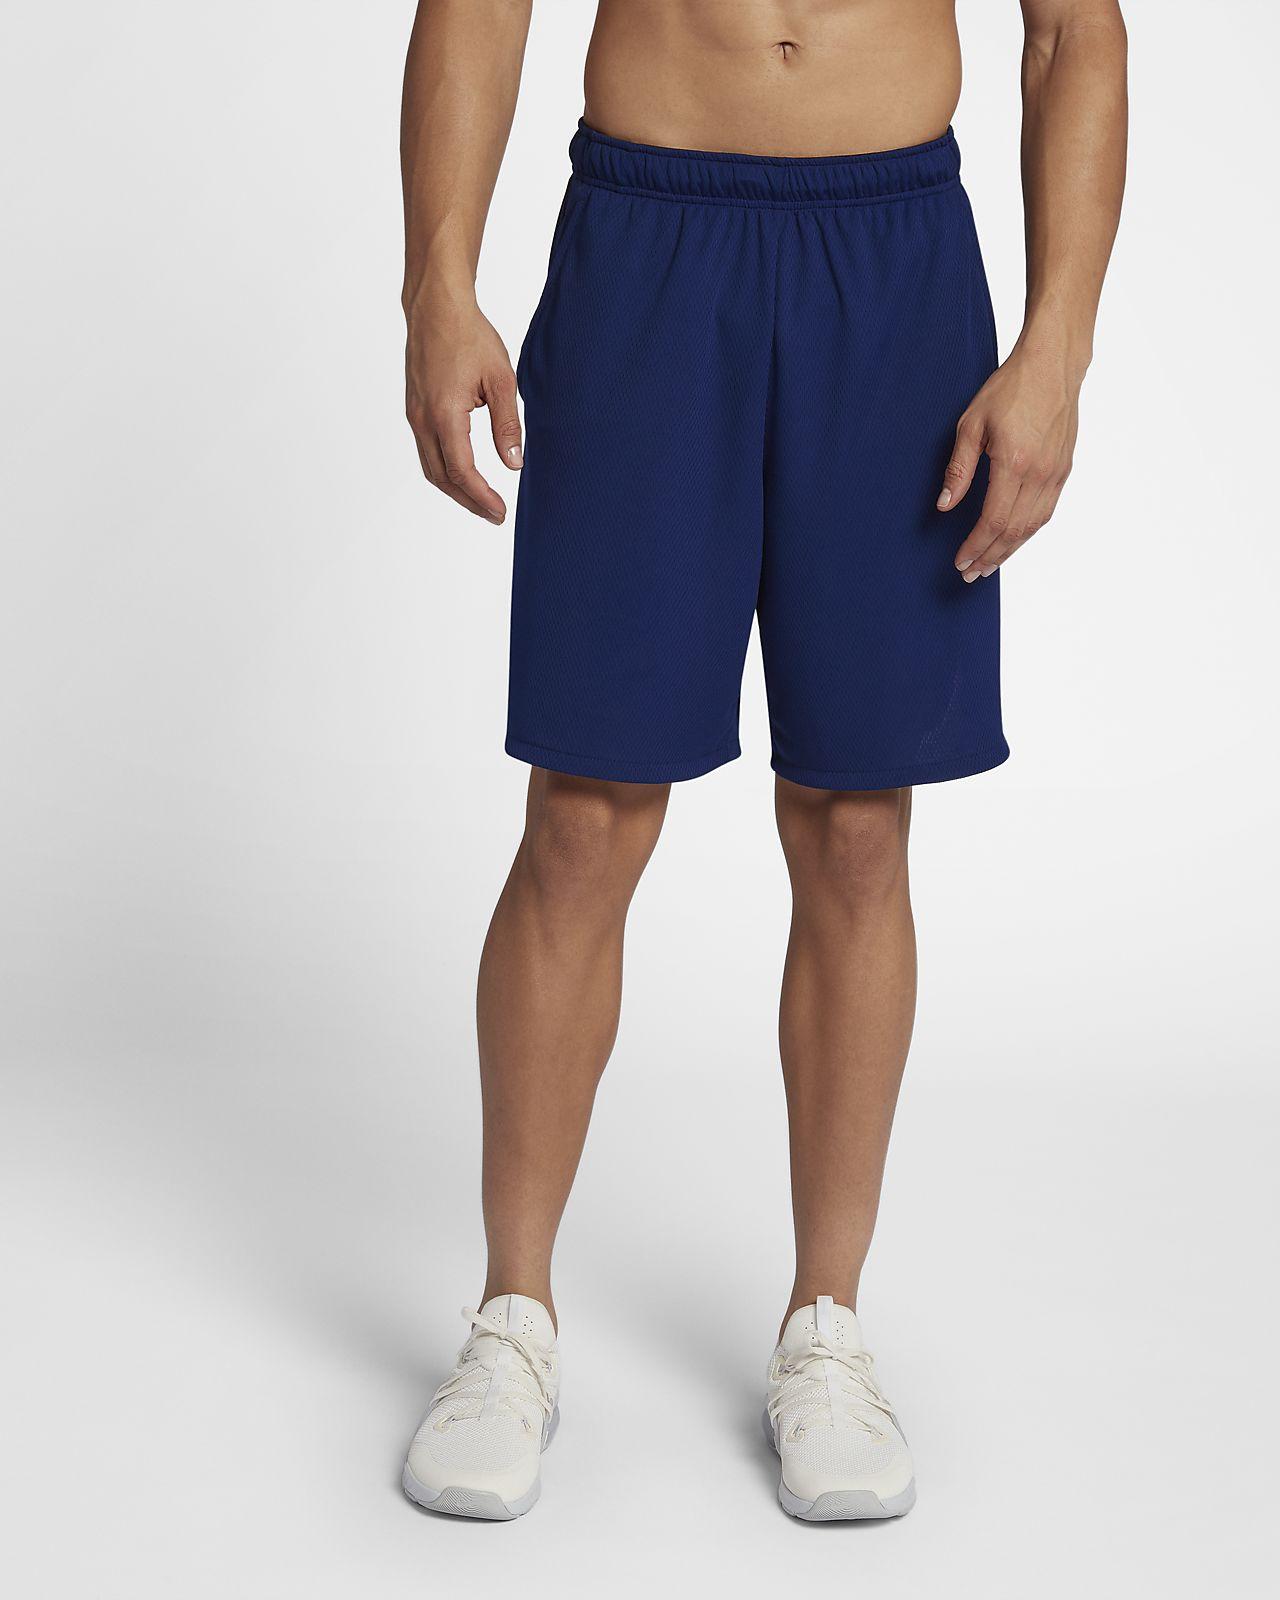 Nike Dri FIT treningsshorts til herre